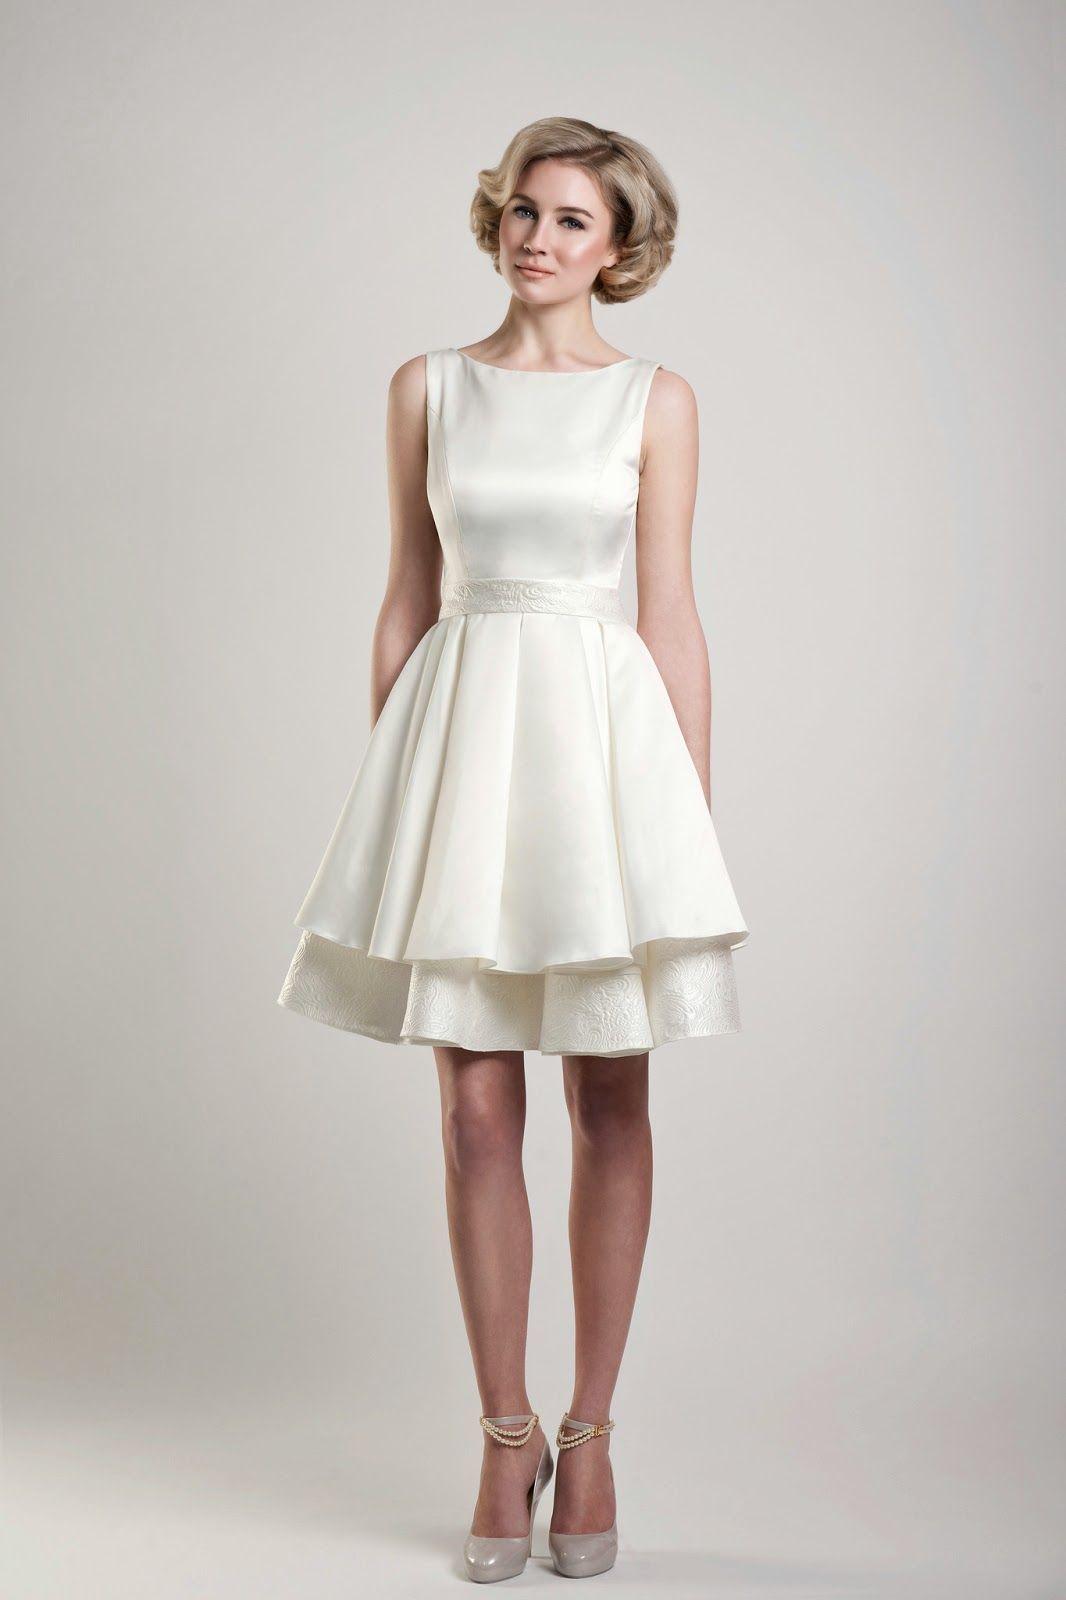 Imagen relacionada | Vestidos de novia | Pinterest | Kleider